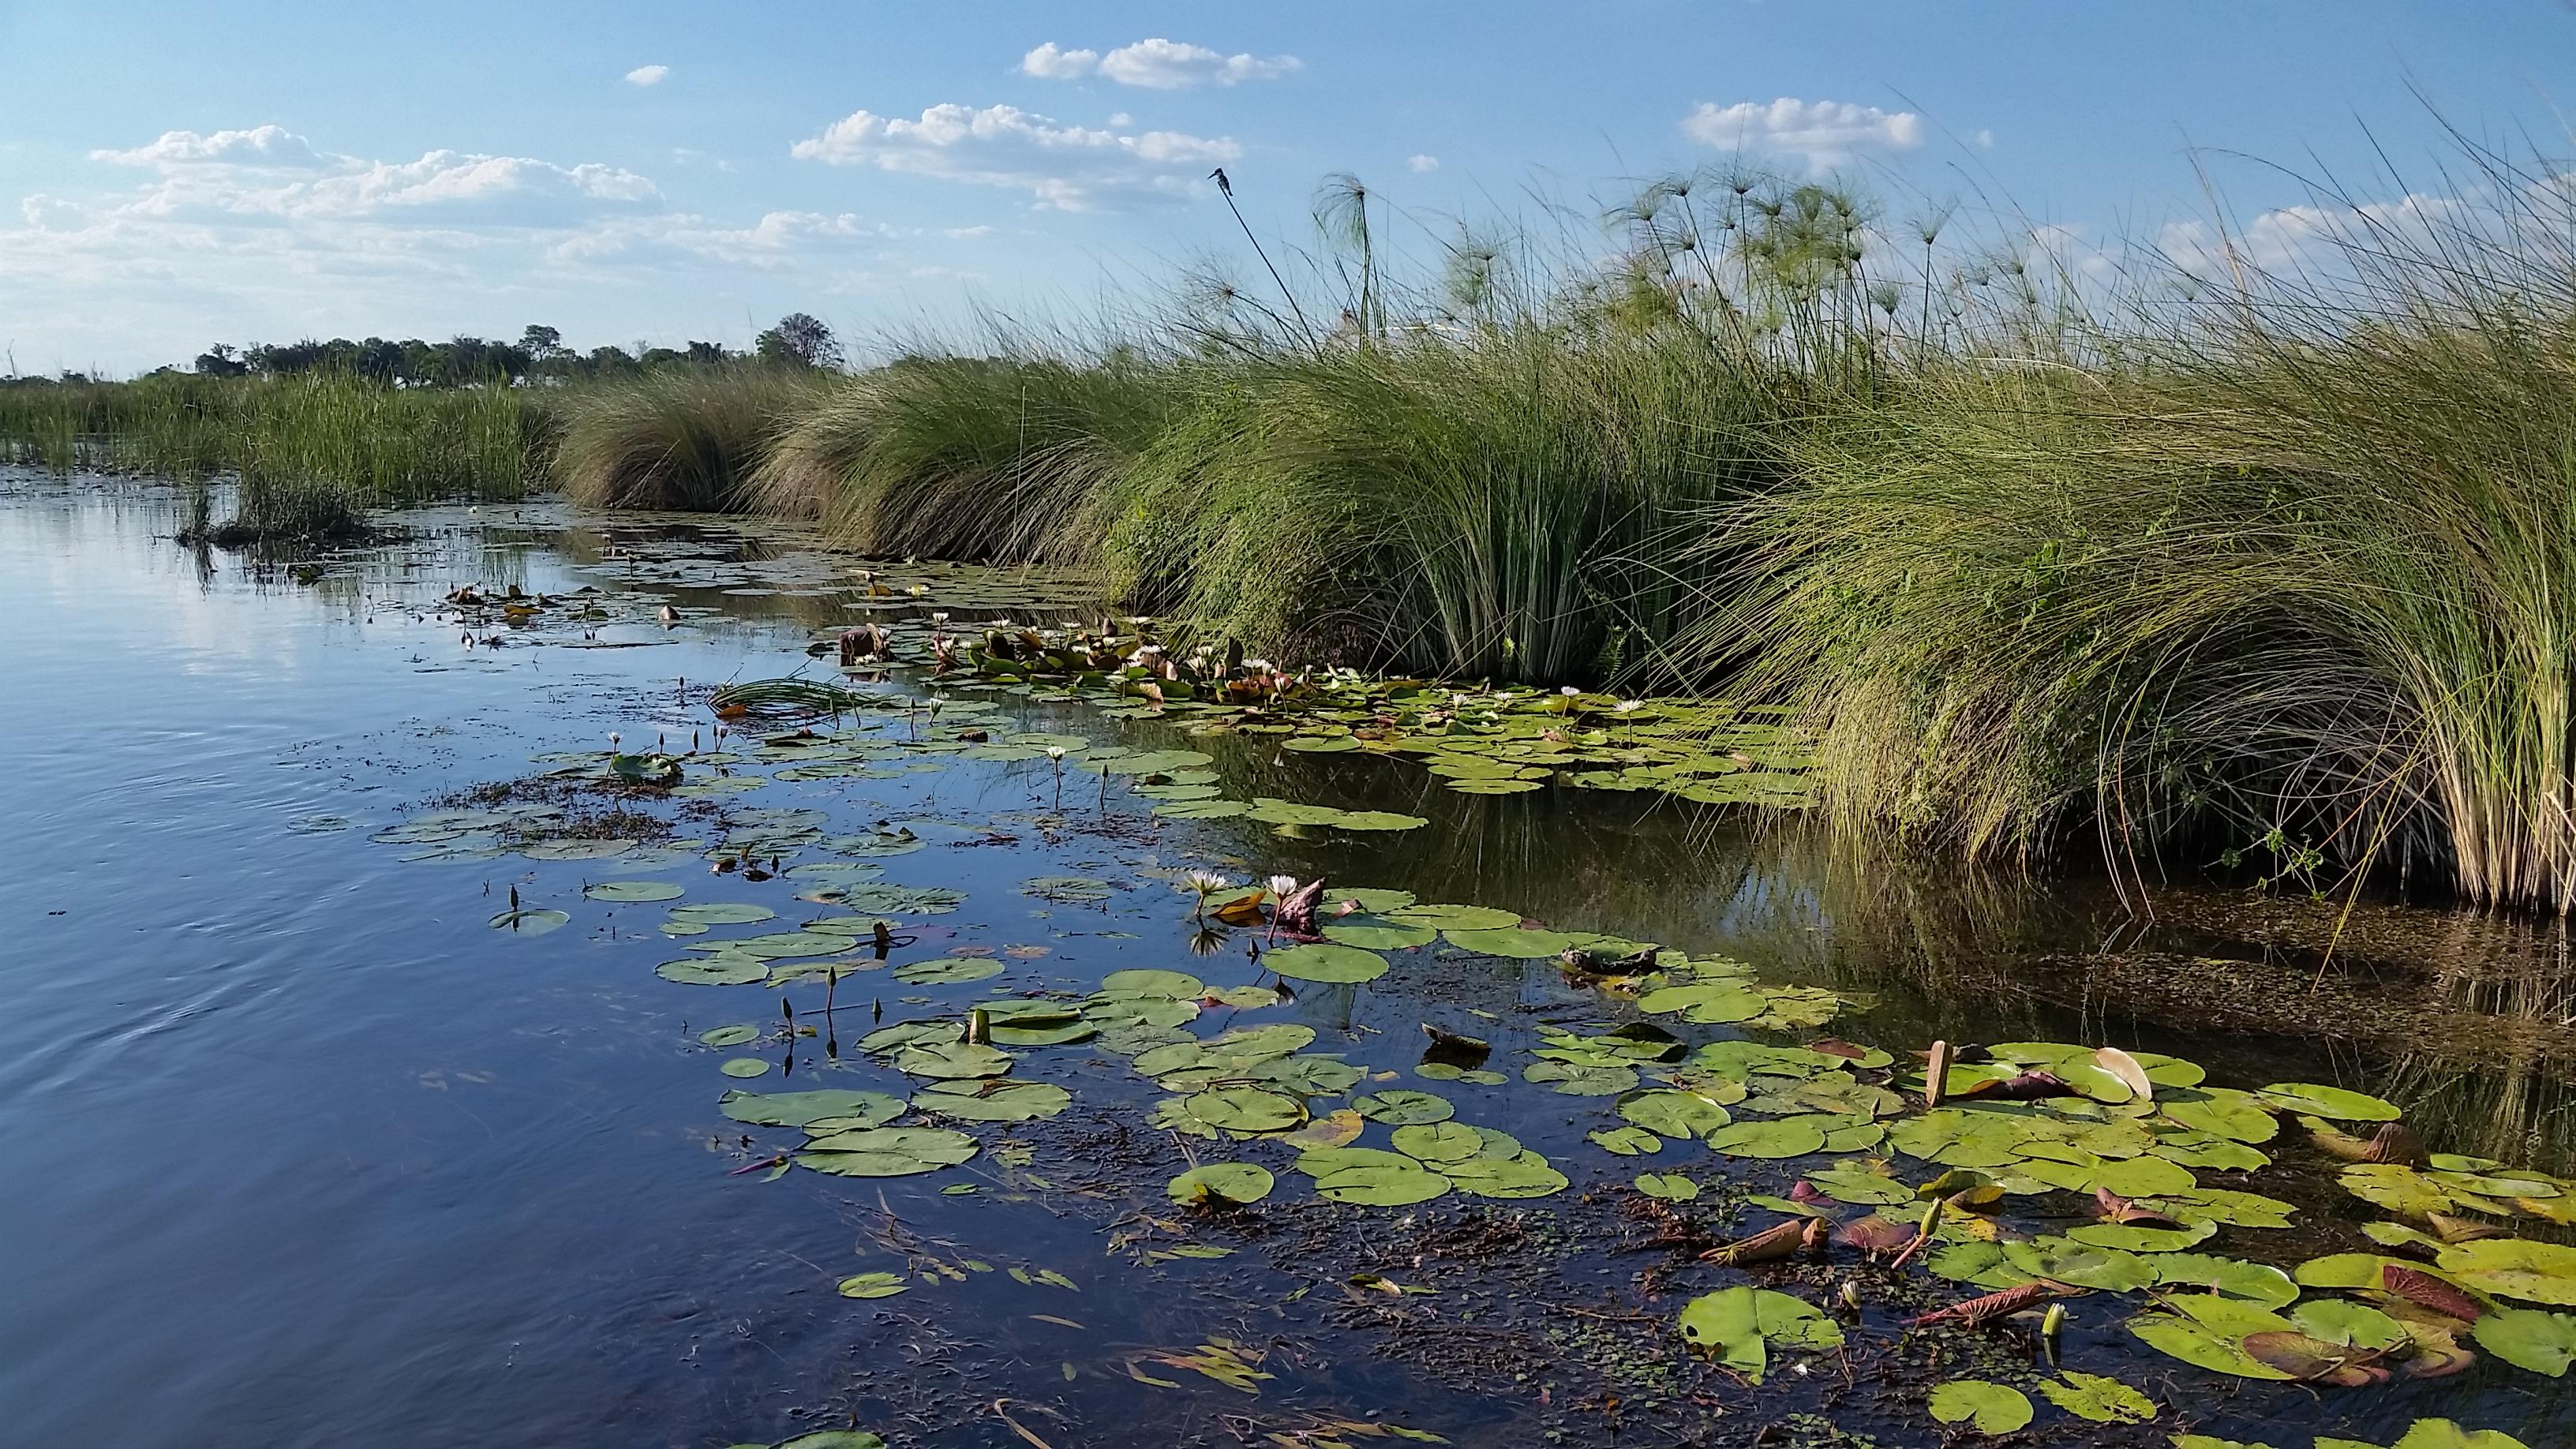 Okavango Delta, Moremi Game Reserve